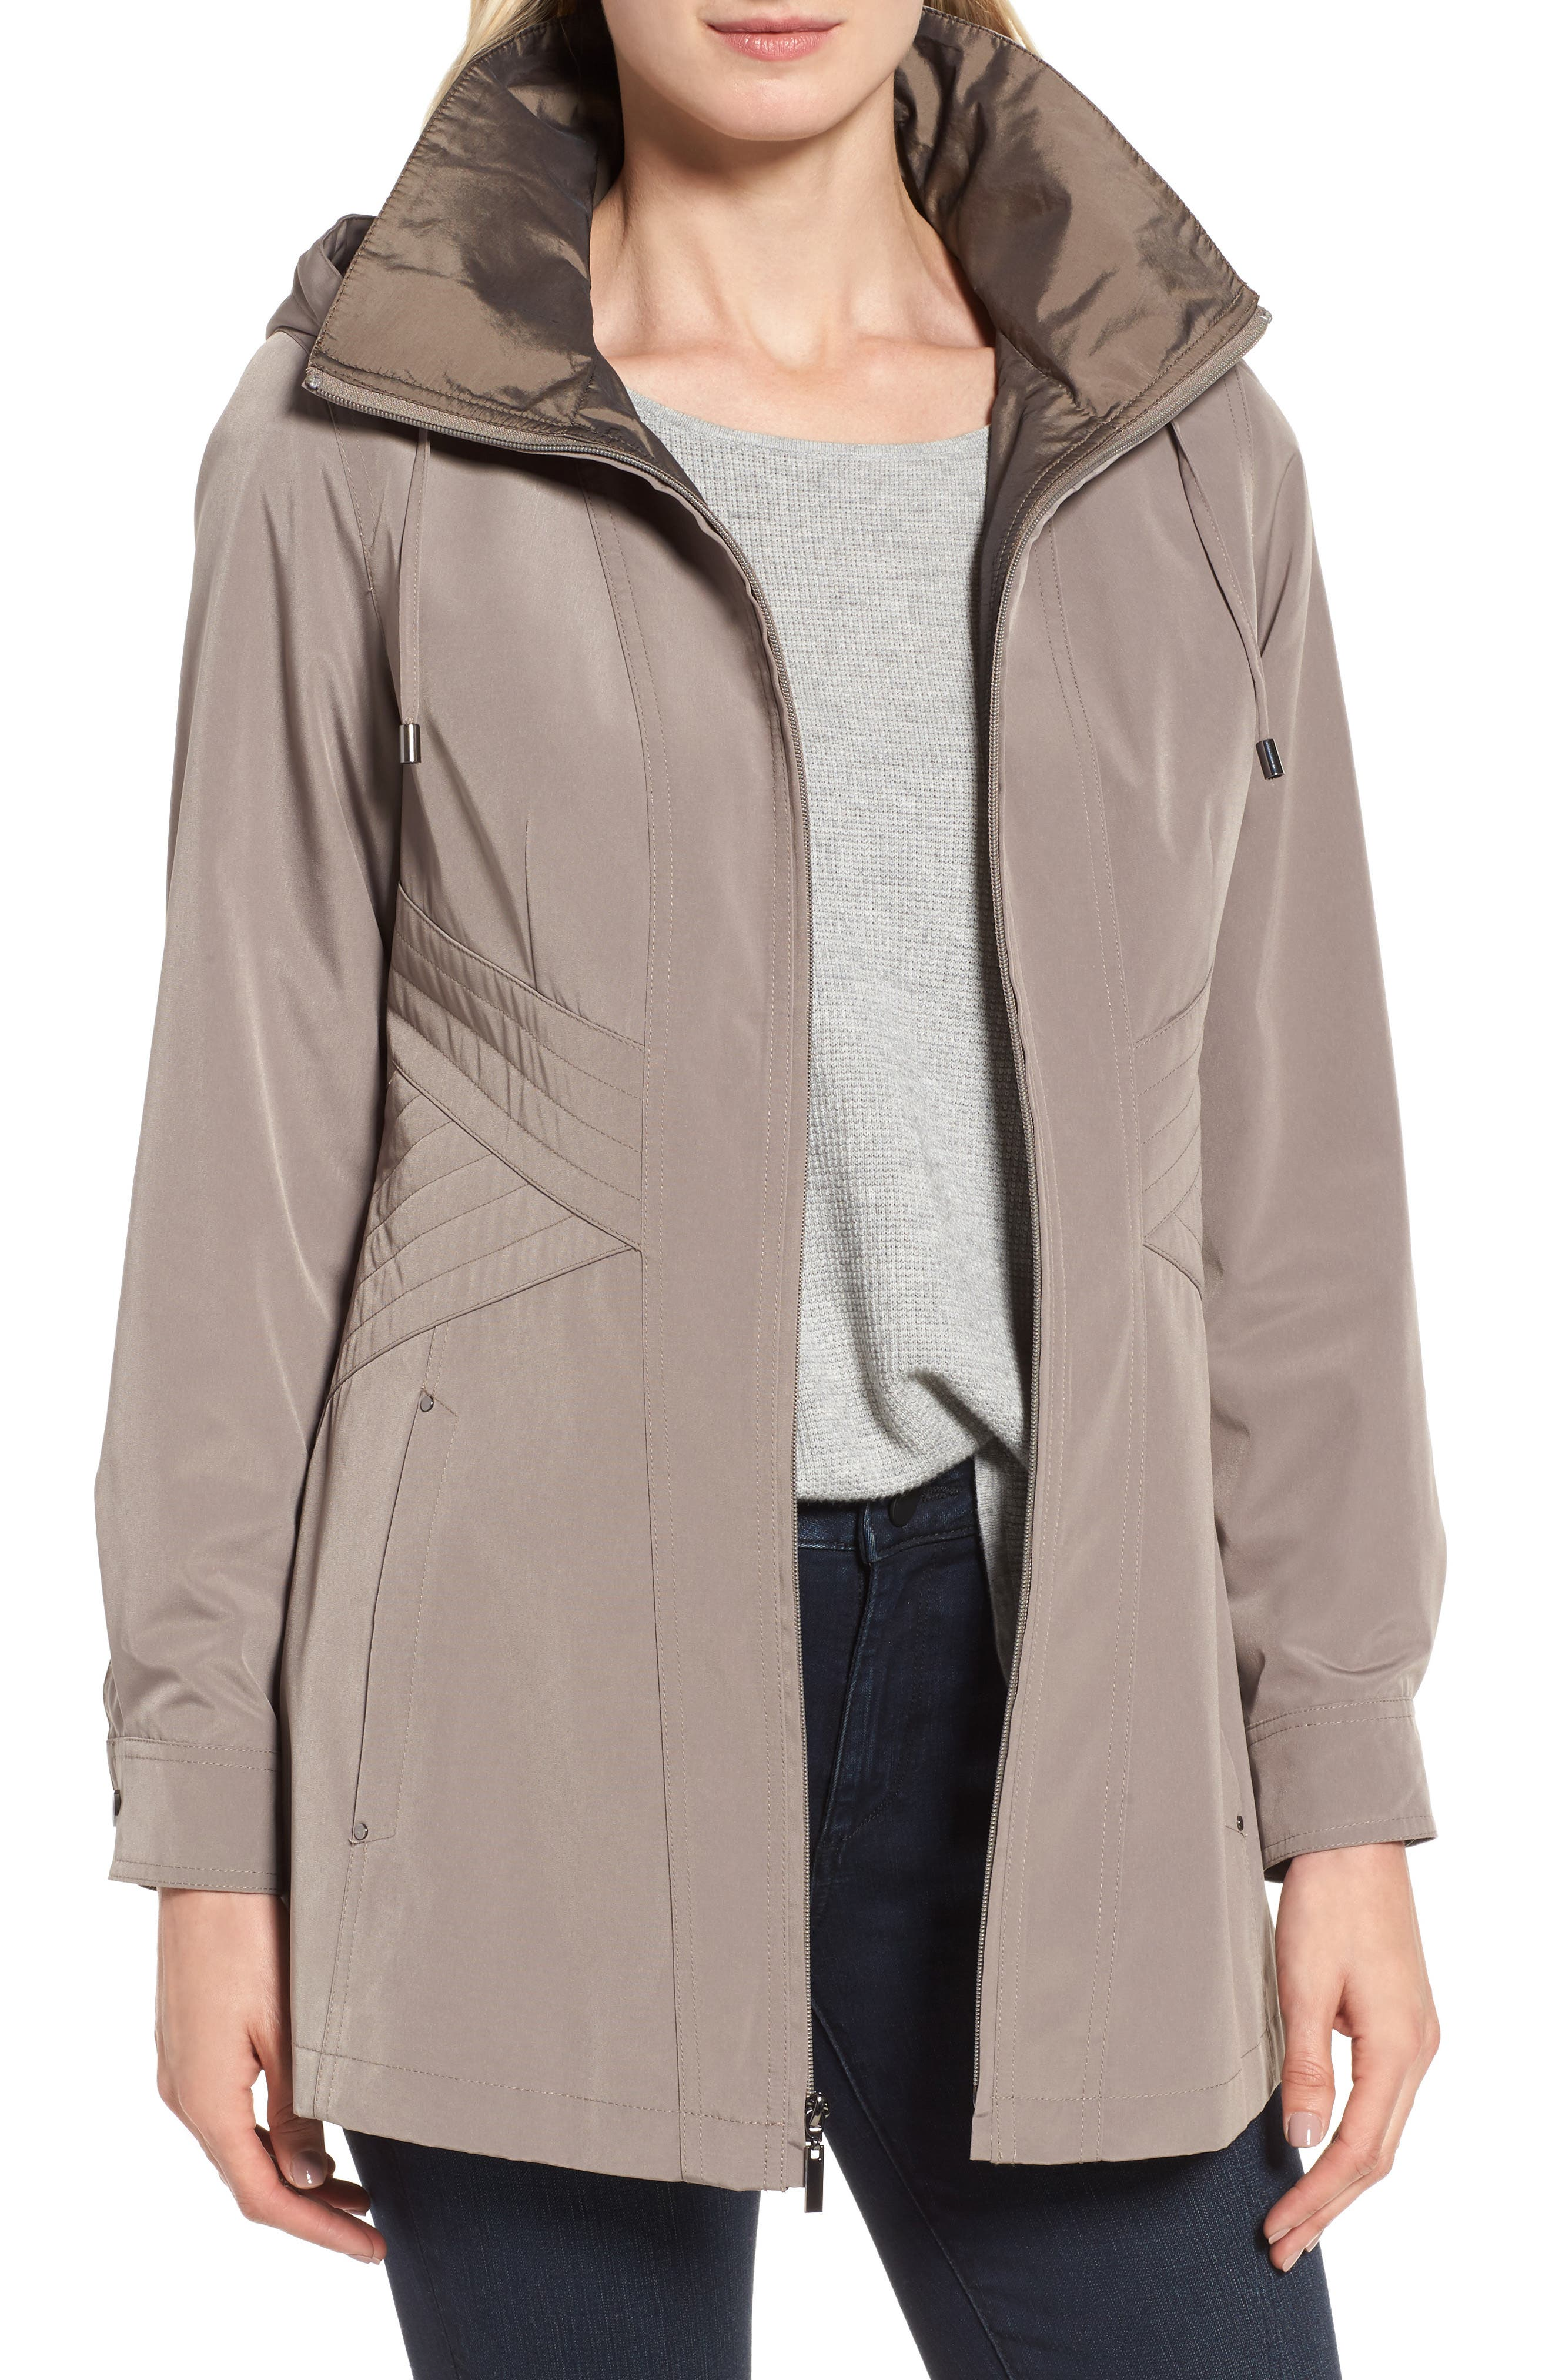 Gallery Two-Tone Long Silk Look Raincoat